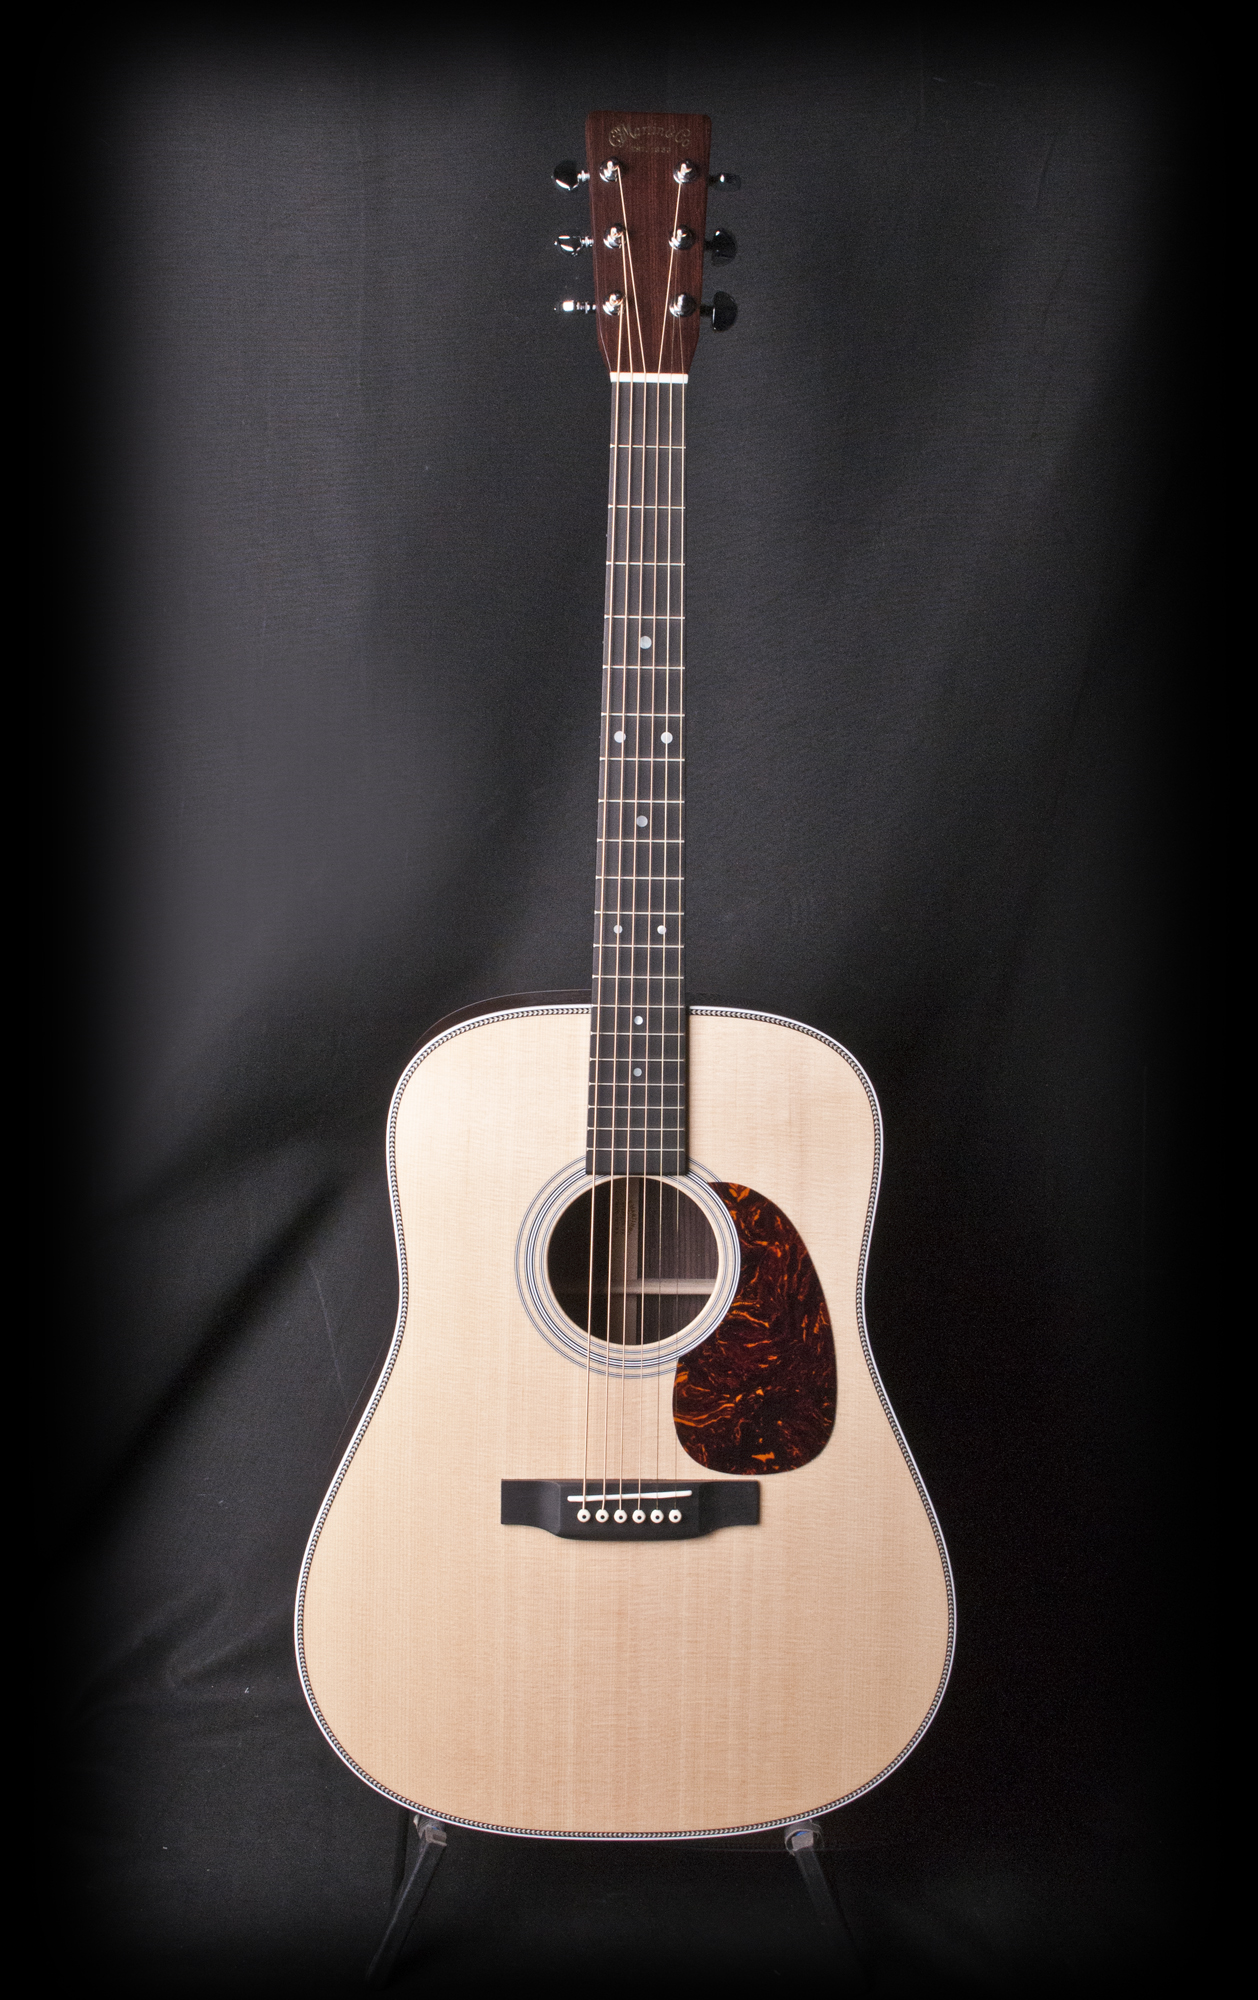 martin hd 28 acoustic guitar w case ebay. Black Bedroom Furniture Sets. Home Design Ideas